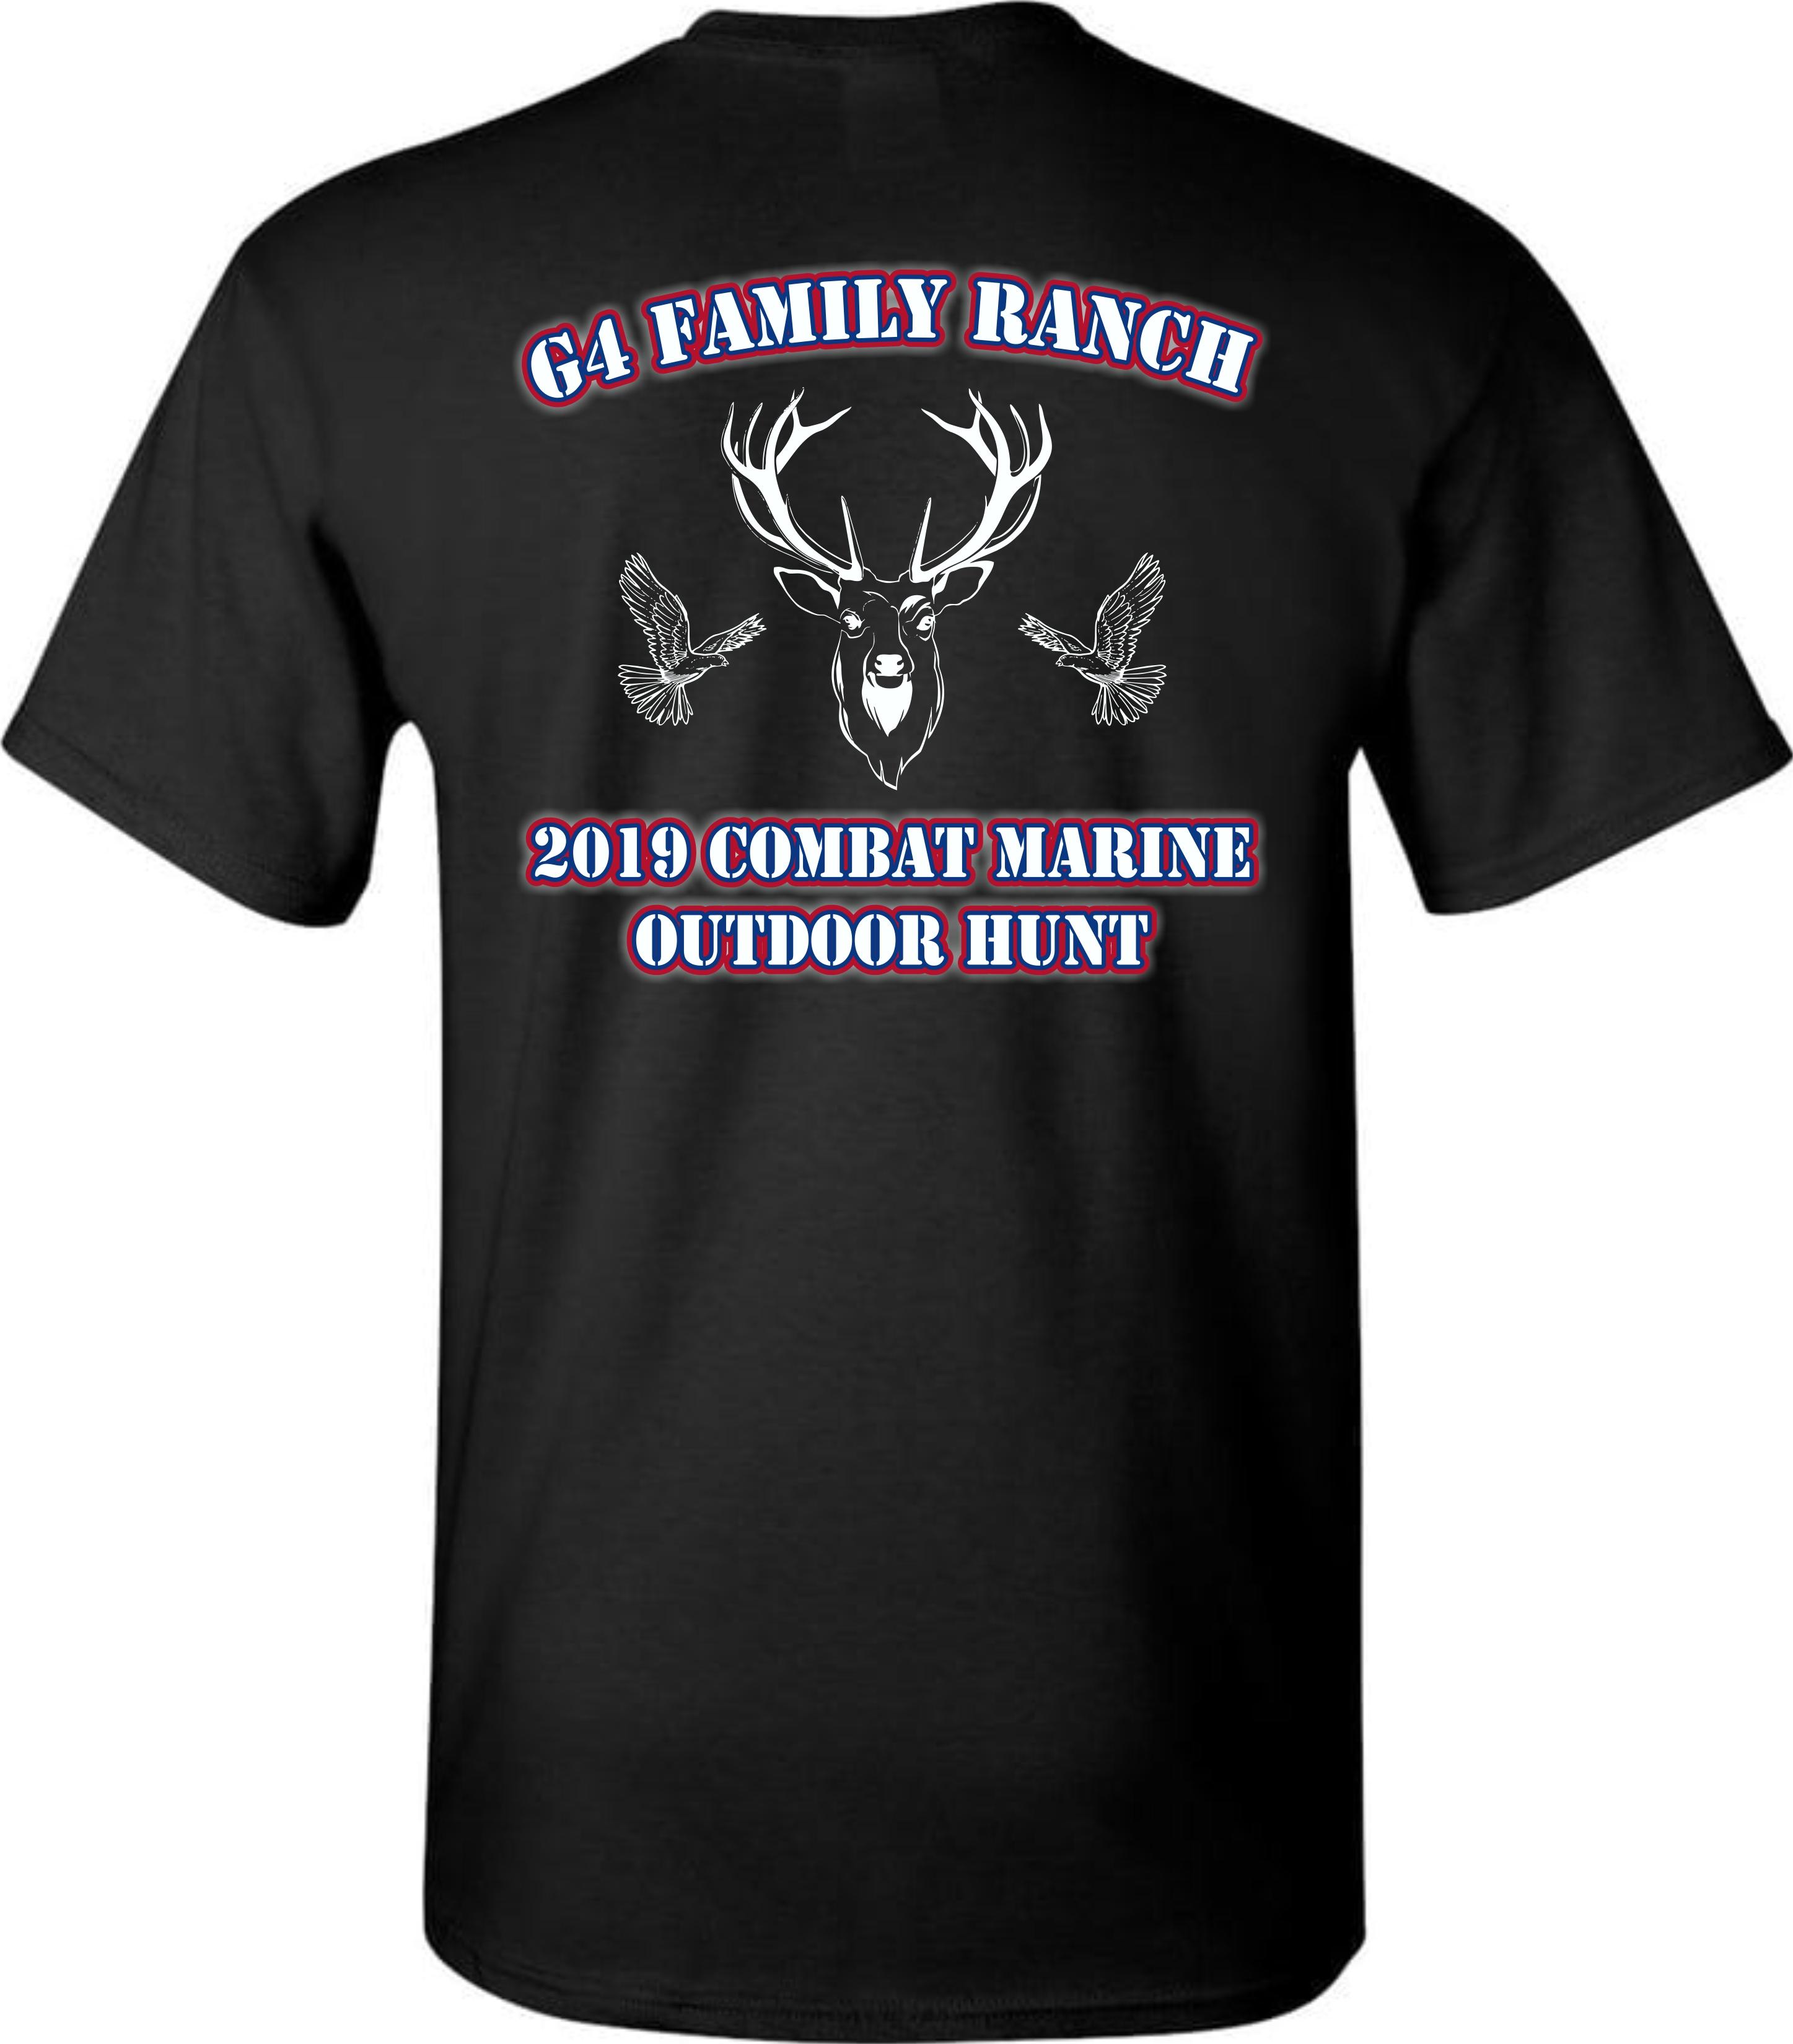 G4 Family Ranch Back art proof